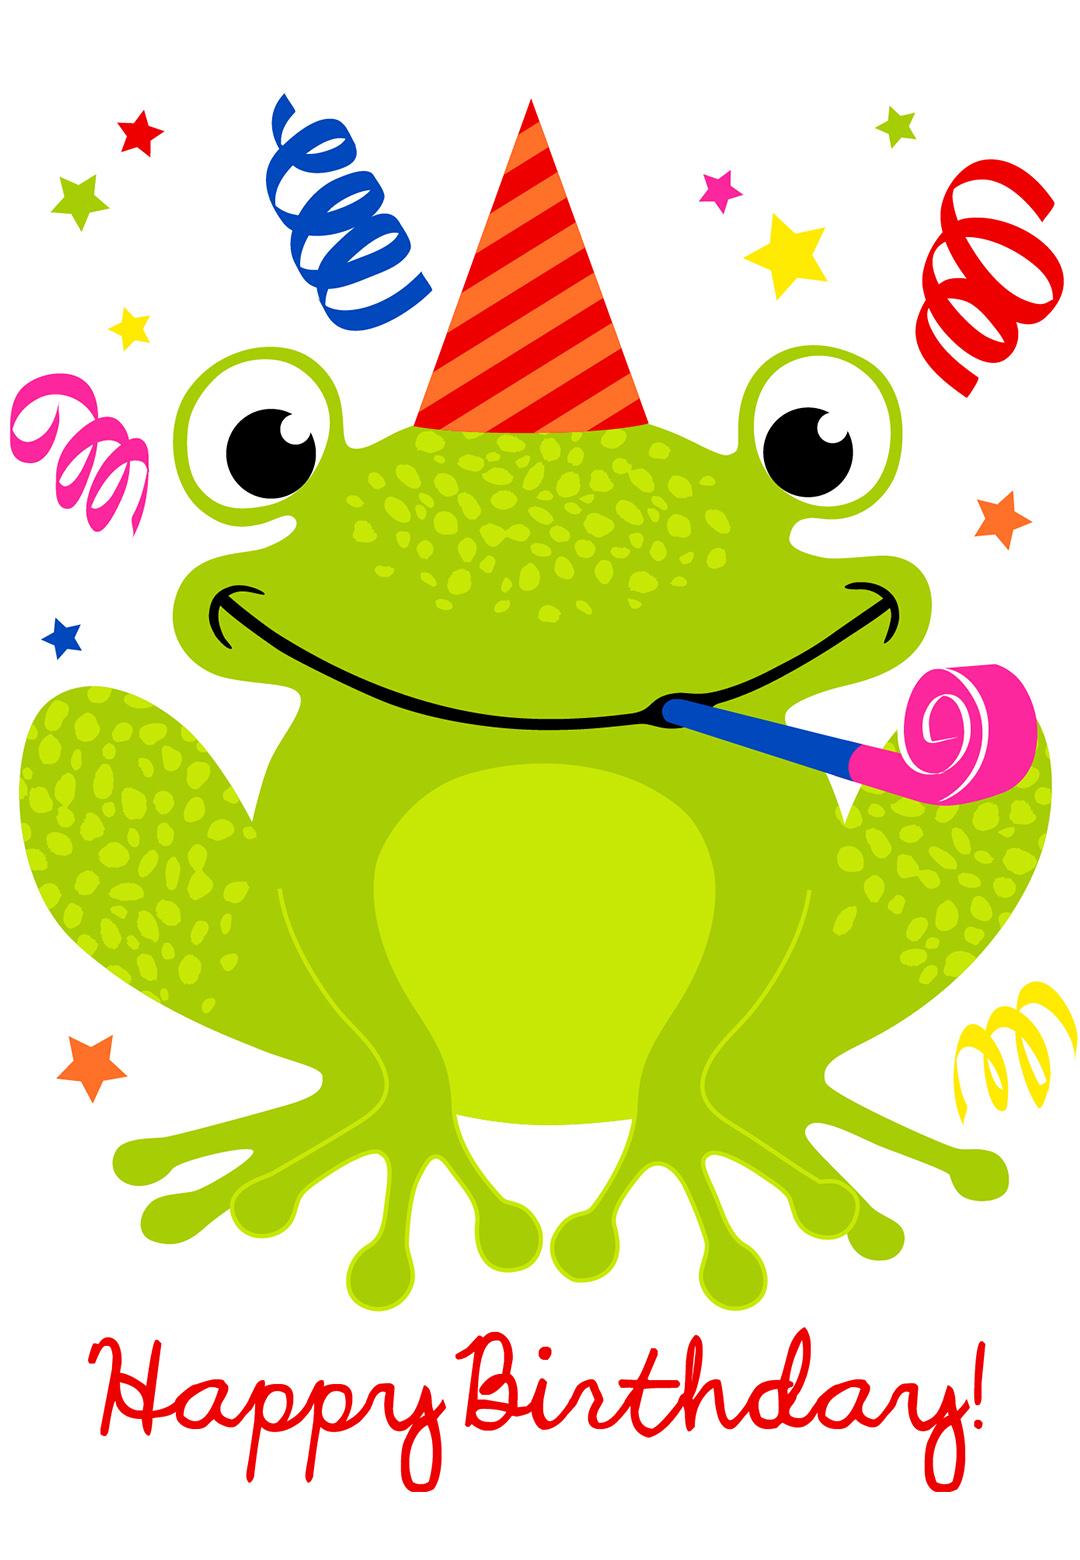 Free Printable A Happy Hopping Birthday Greeting Card.